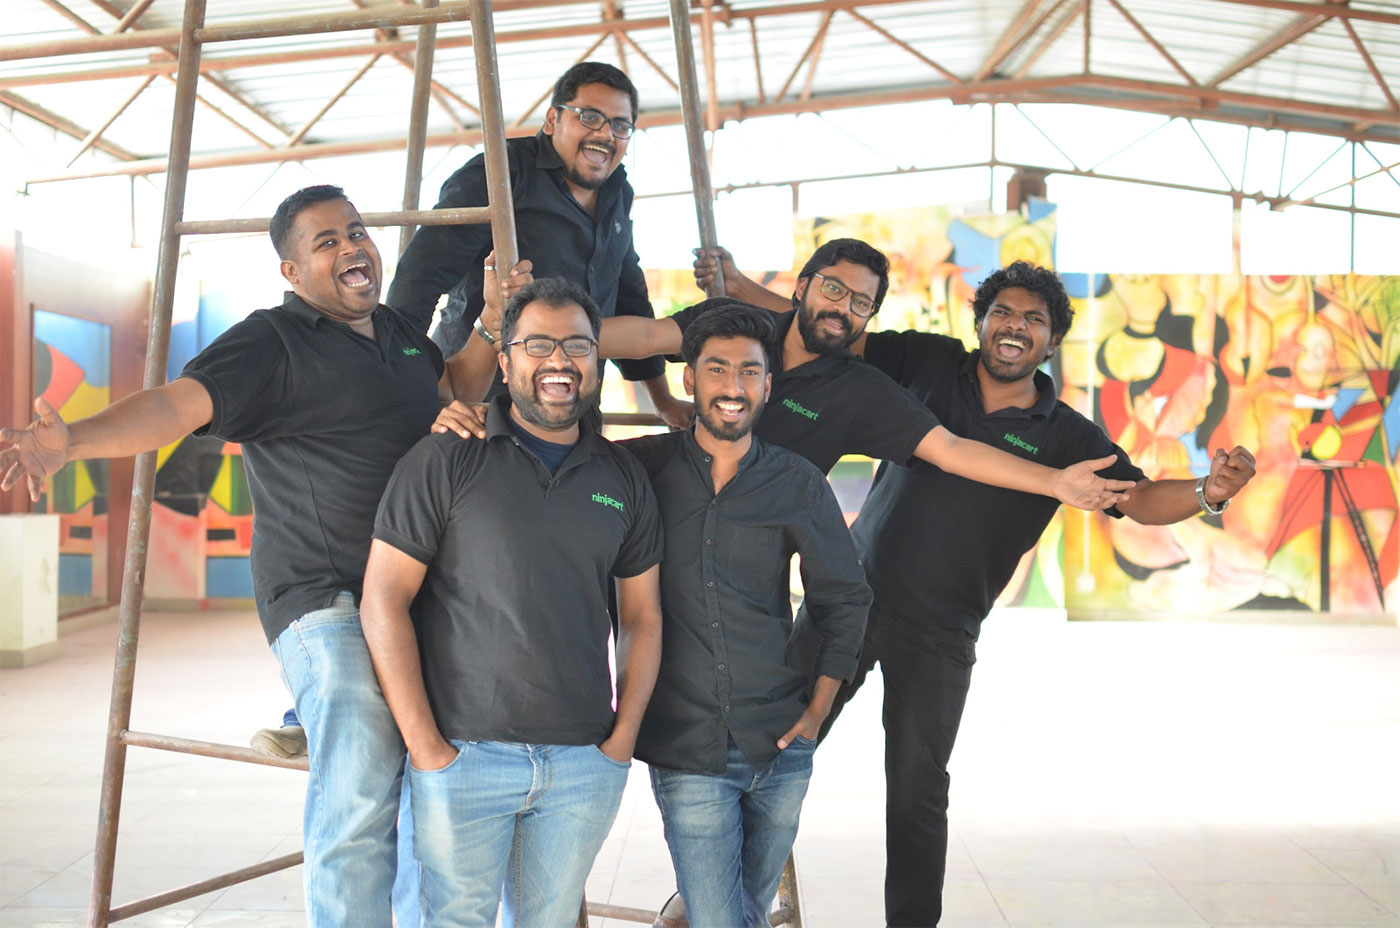 All Ninjacart Founders together | Thirukumaran Nagarajan, Vasudevan Chinnathambi, Ashutosh Vikram, Kartheeswaran KK, Sharath Babu Loganathan